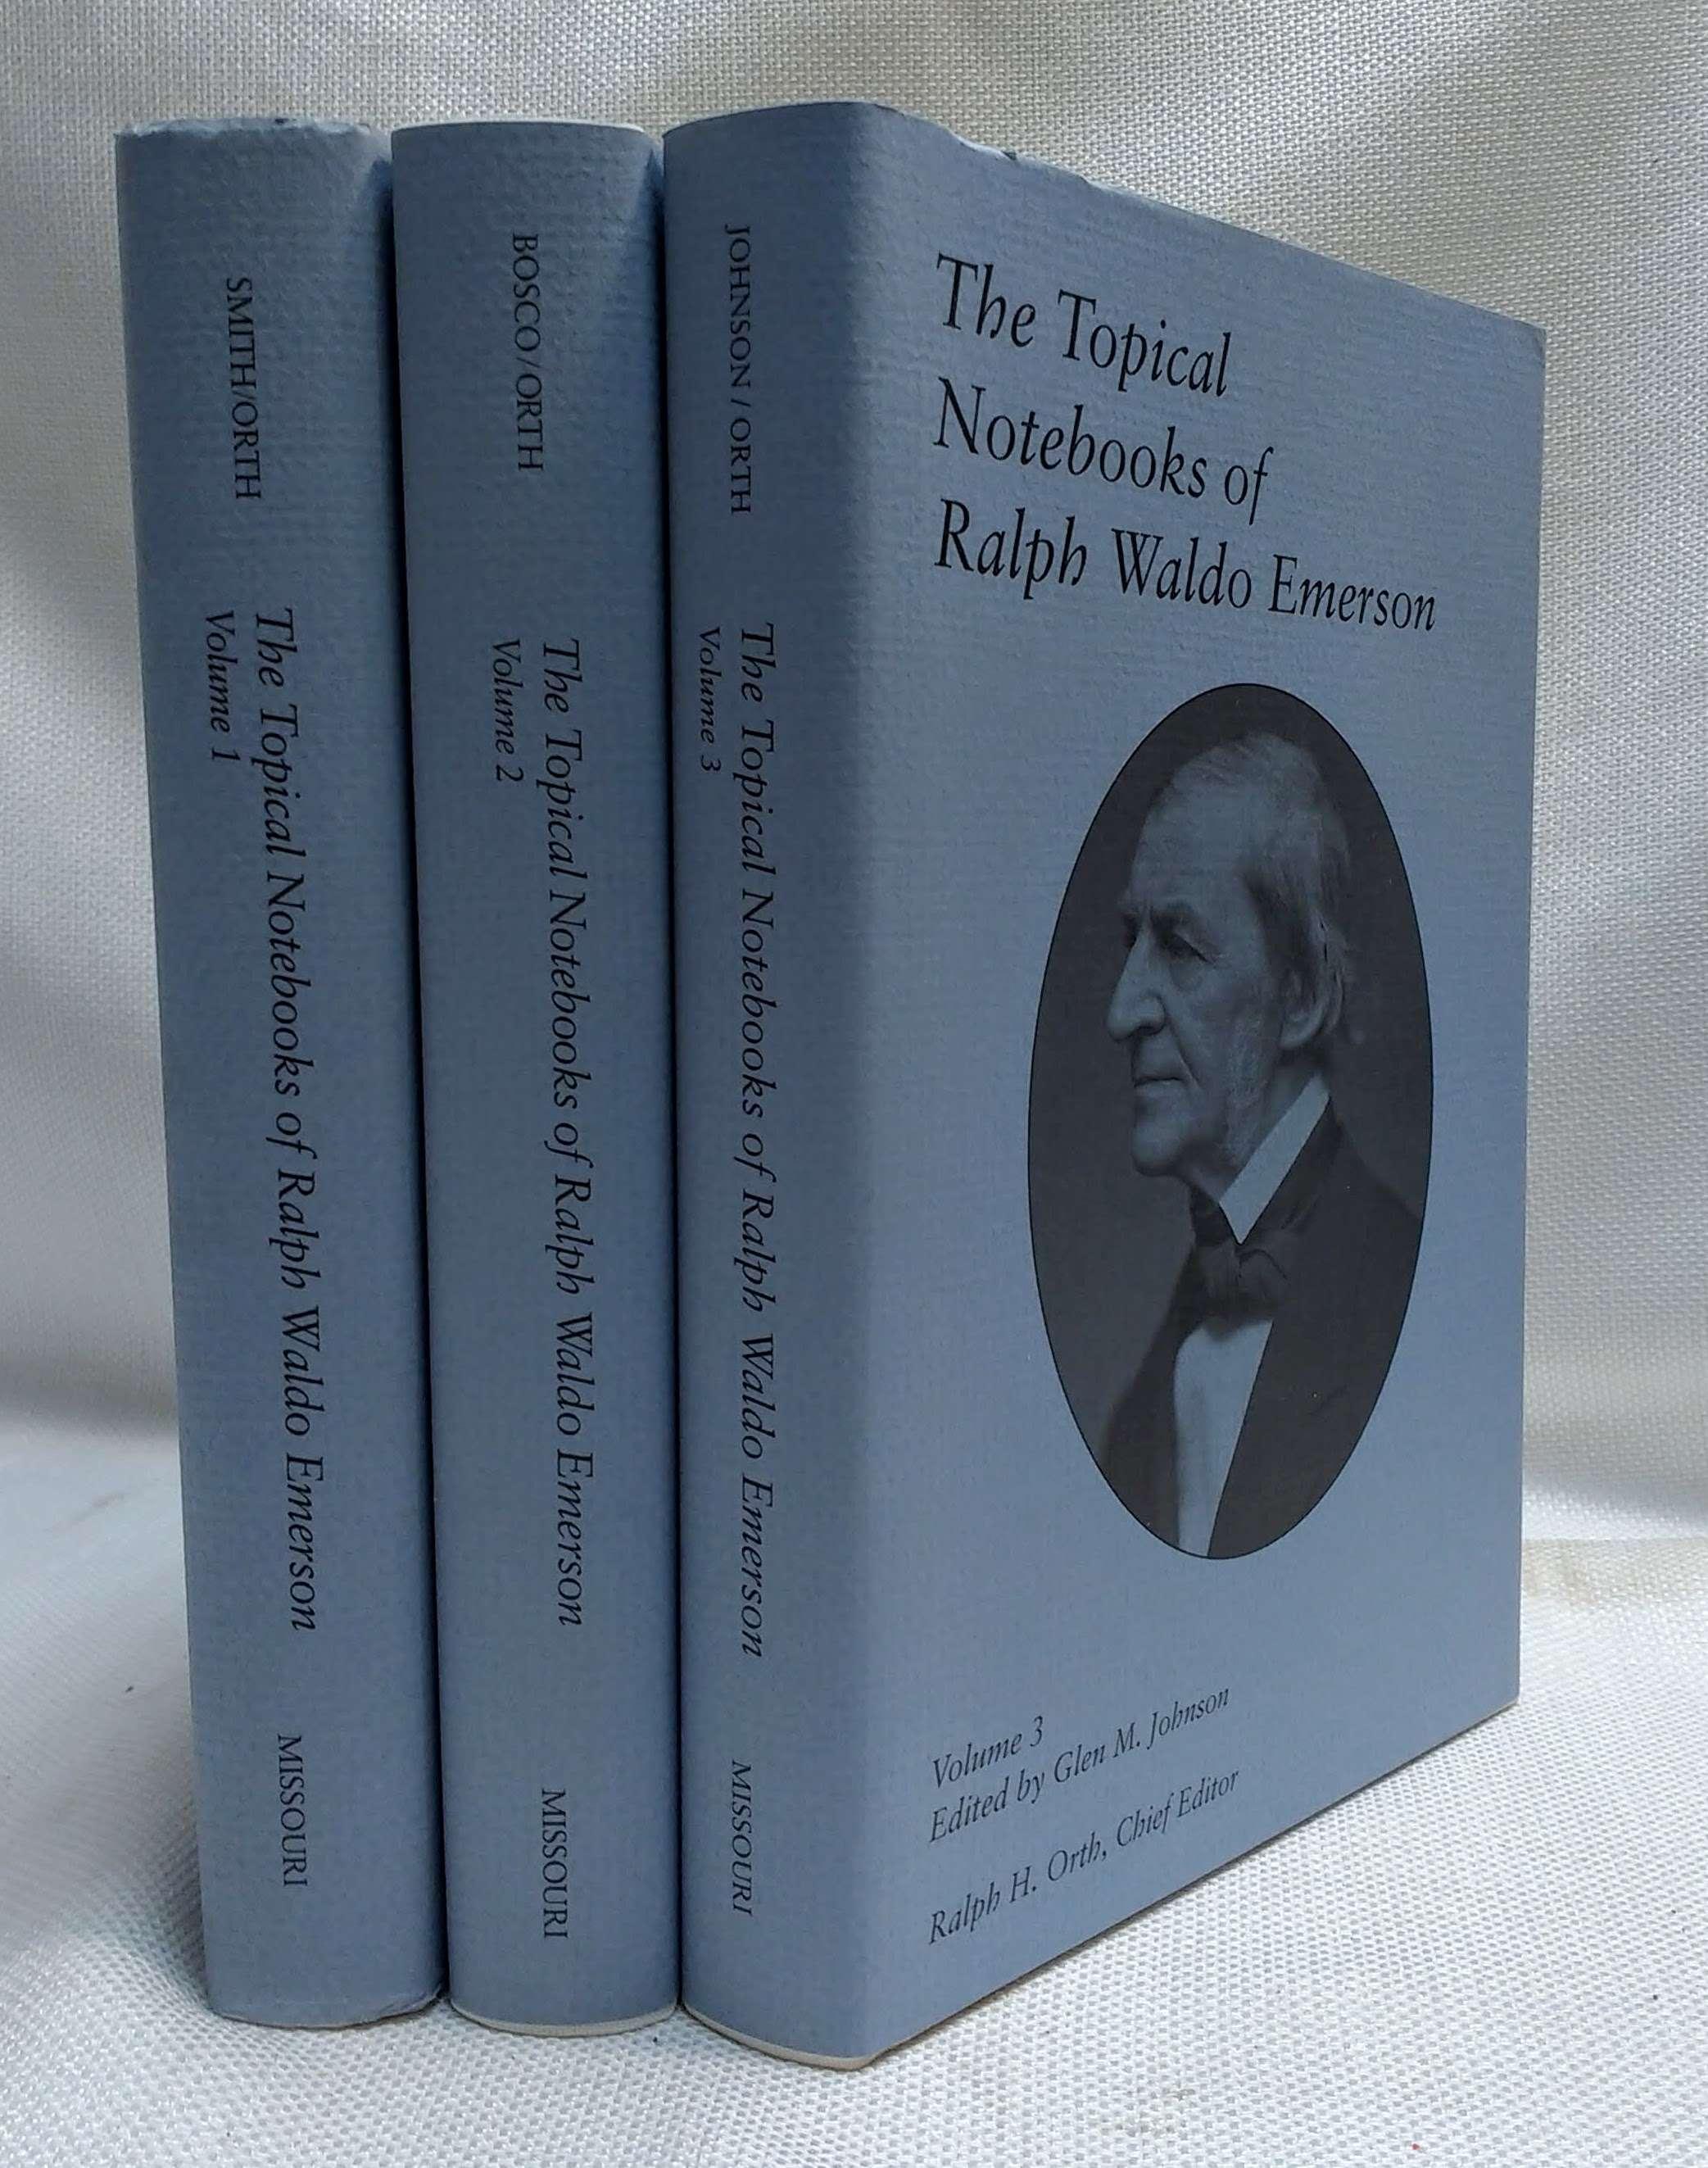 The Topical Notebooks of Ralph Waldo Emerson [Complete in three volumes], Emerson, Ralph Waldo; Susan Sutton Smith [Editor]